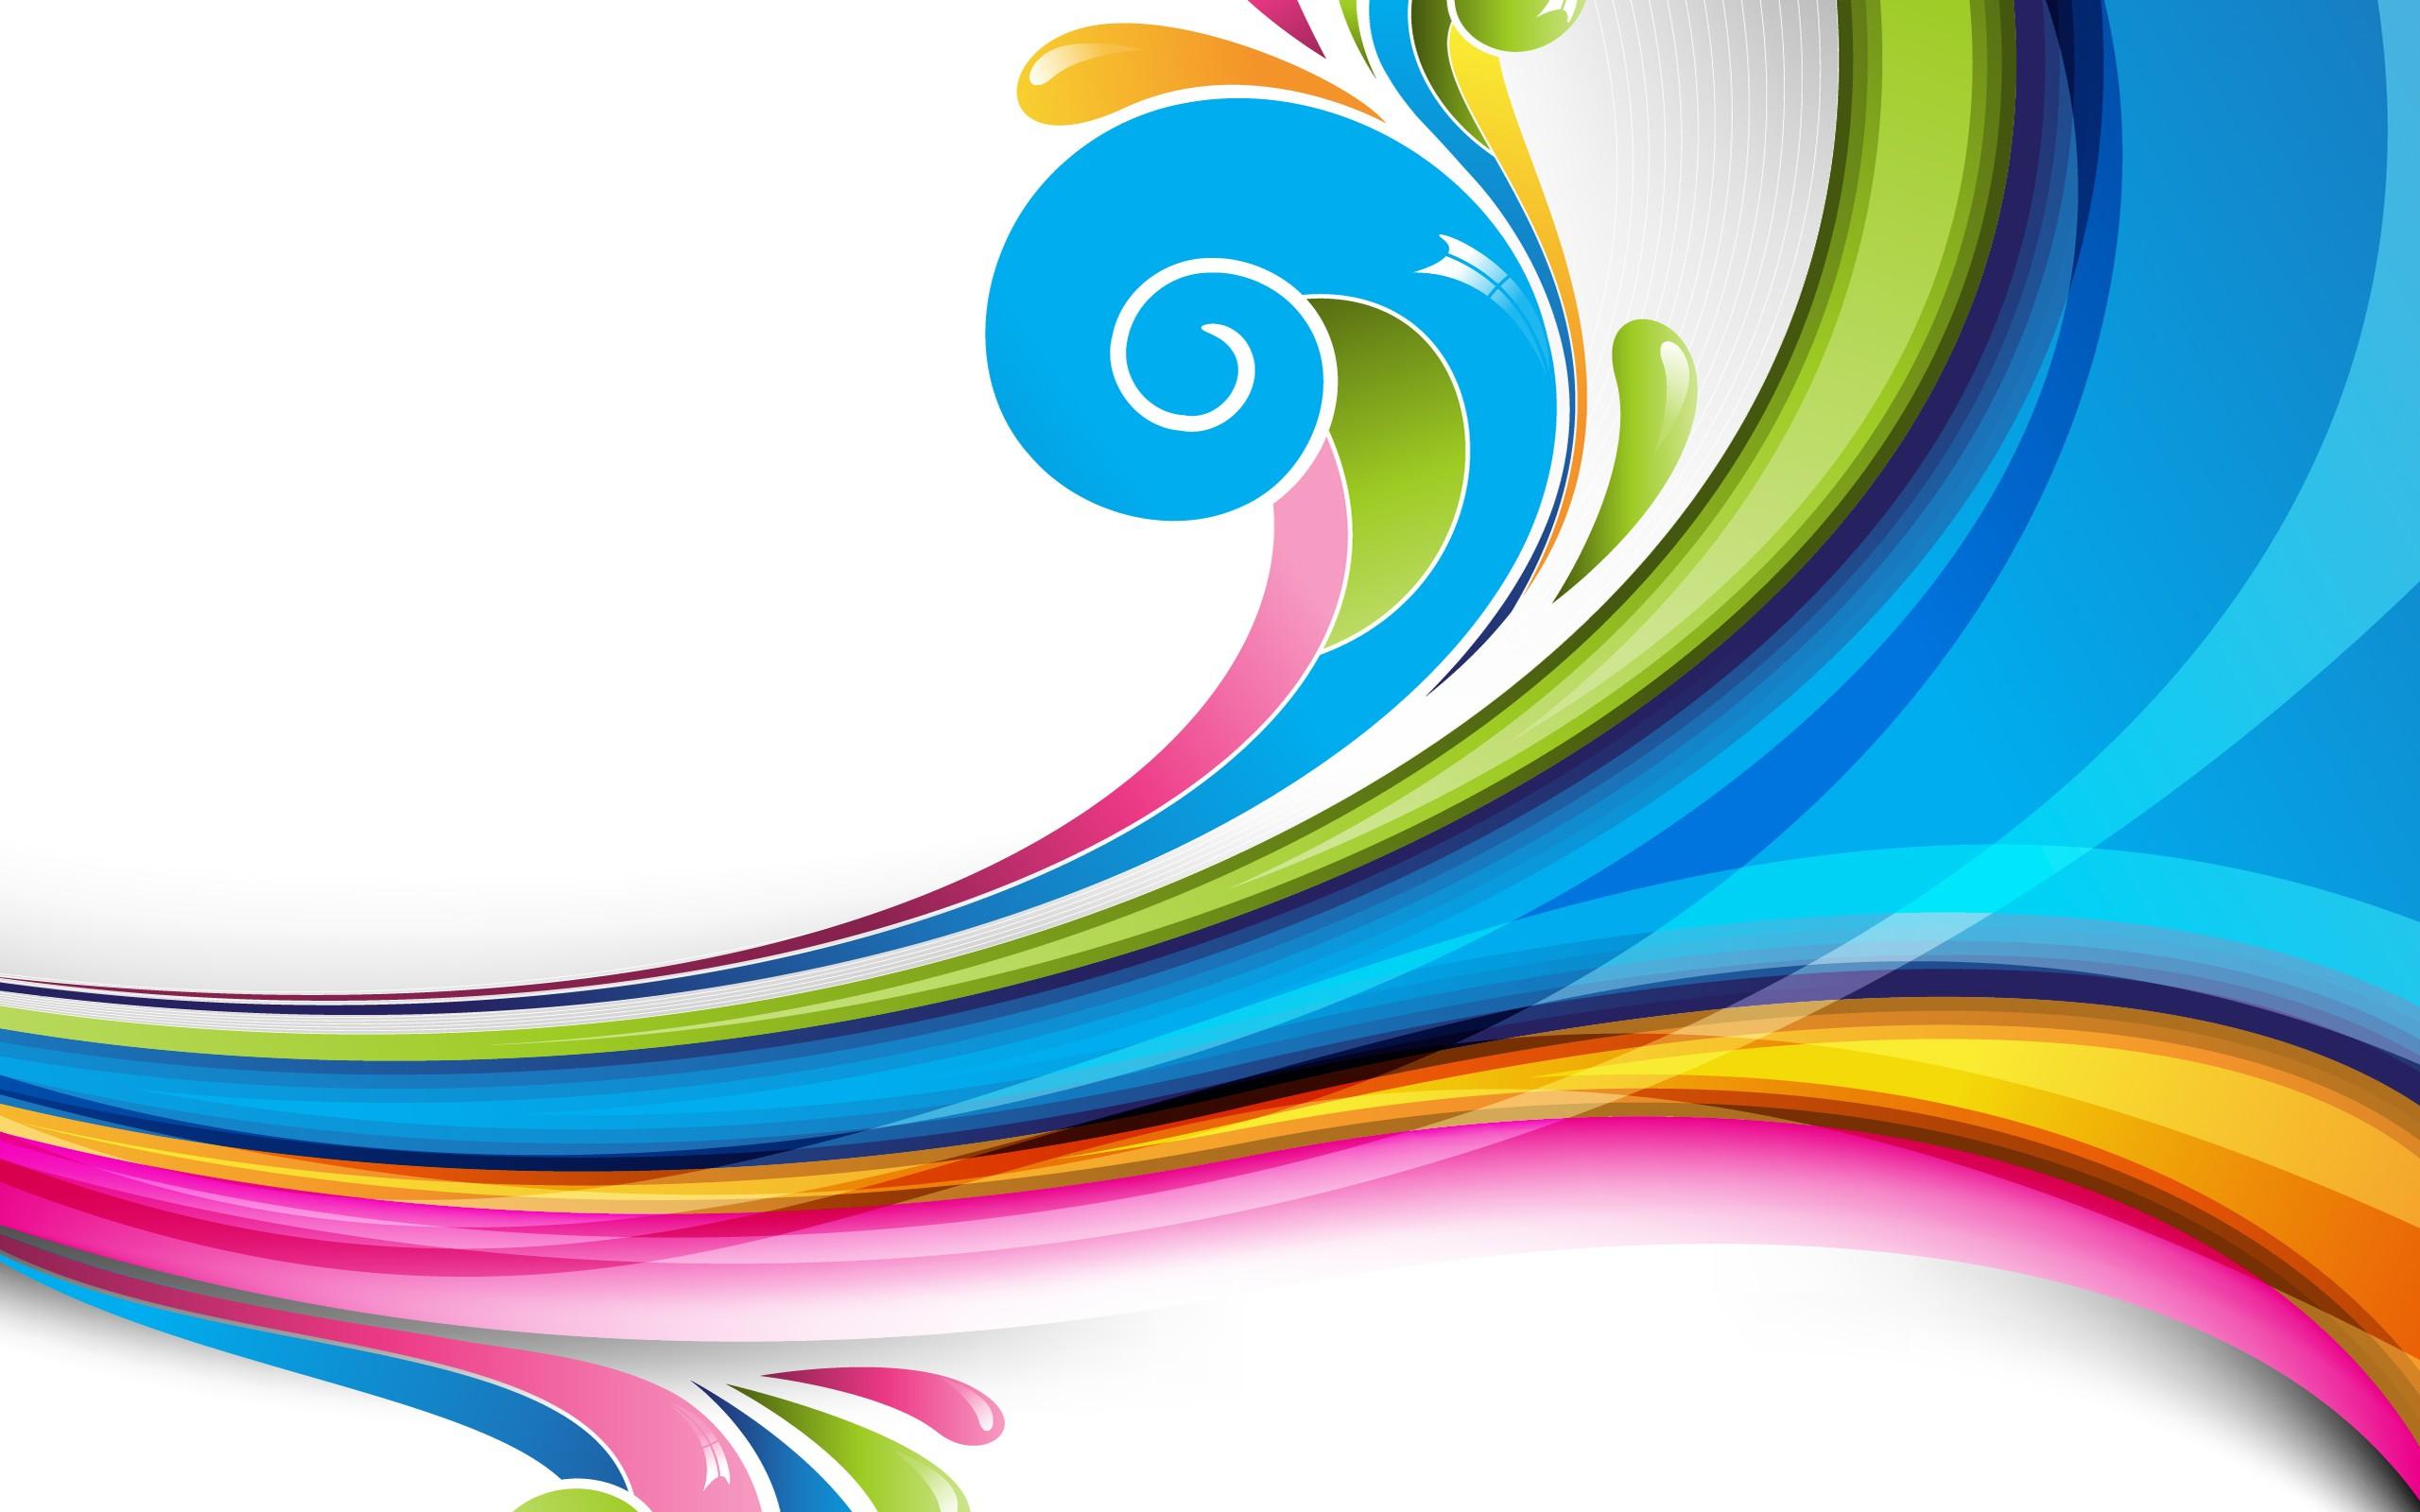 Drawing Vector Lines In Photo Cs : Fondos de pantalla vistoso ilustración espiral líneas